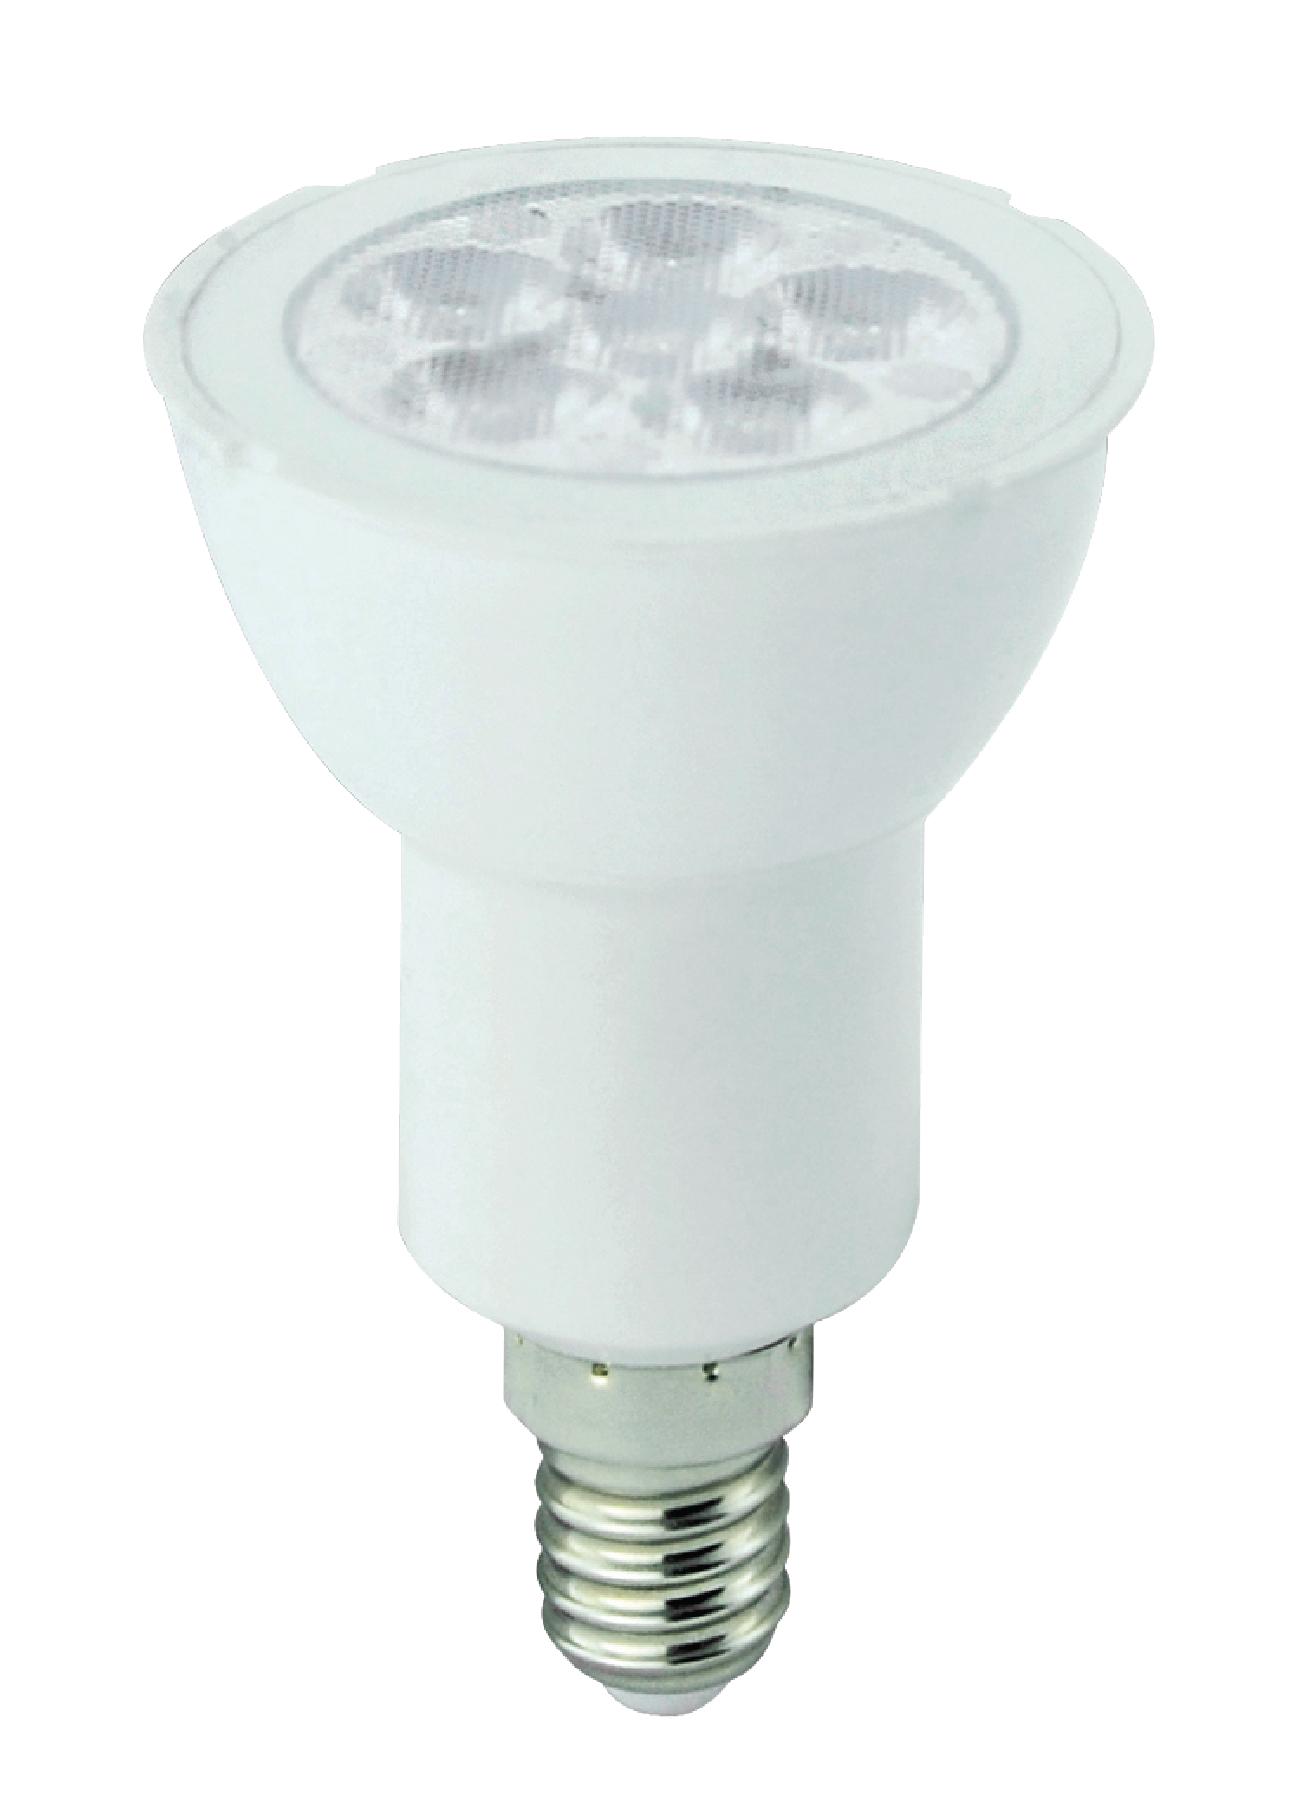 HQ LED reflektorová žárovka R50 E14 4.7W 350lm 2700K (HQLE14REFL001)